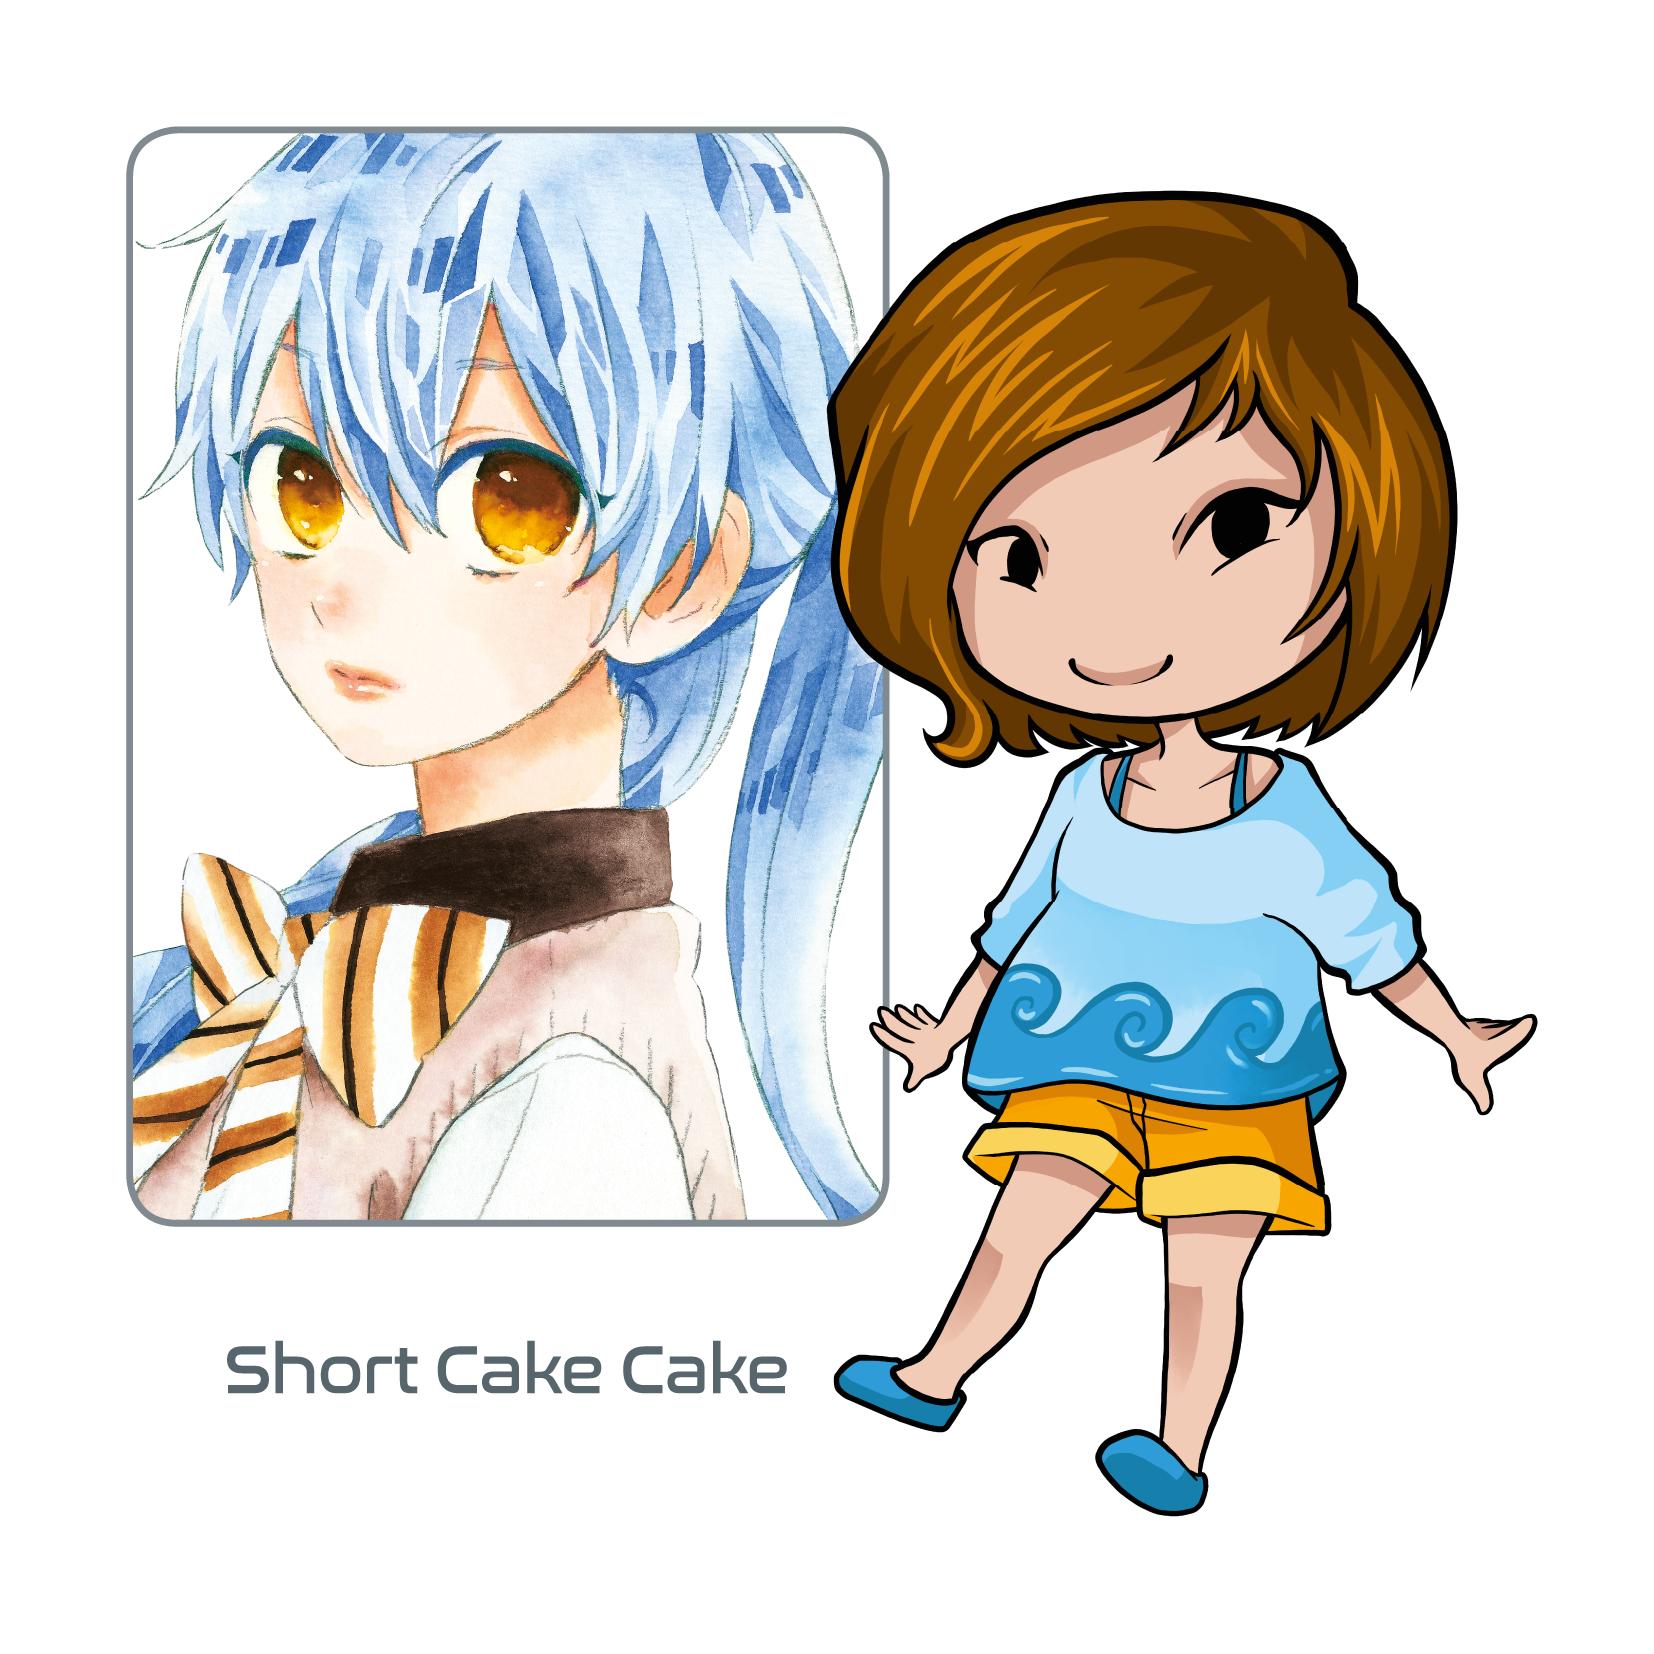 Short Cake Cake